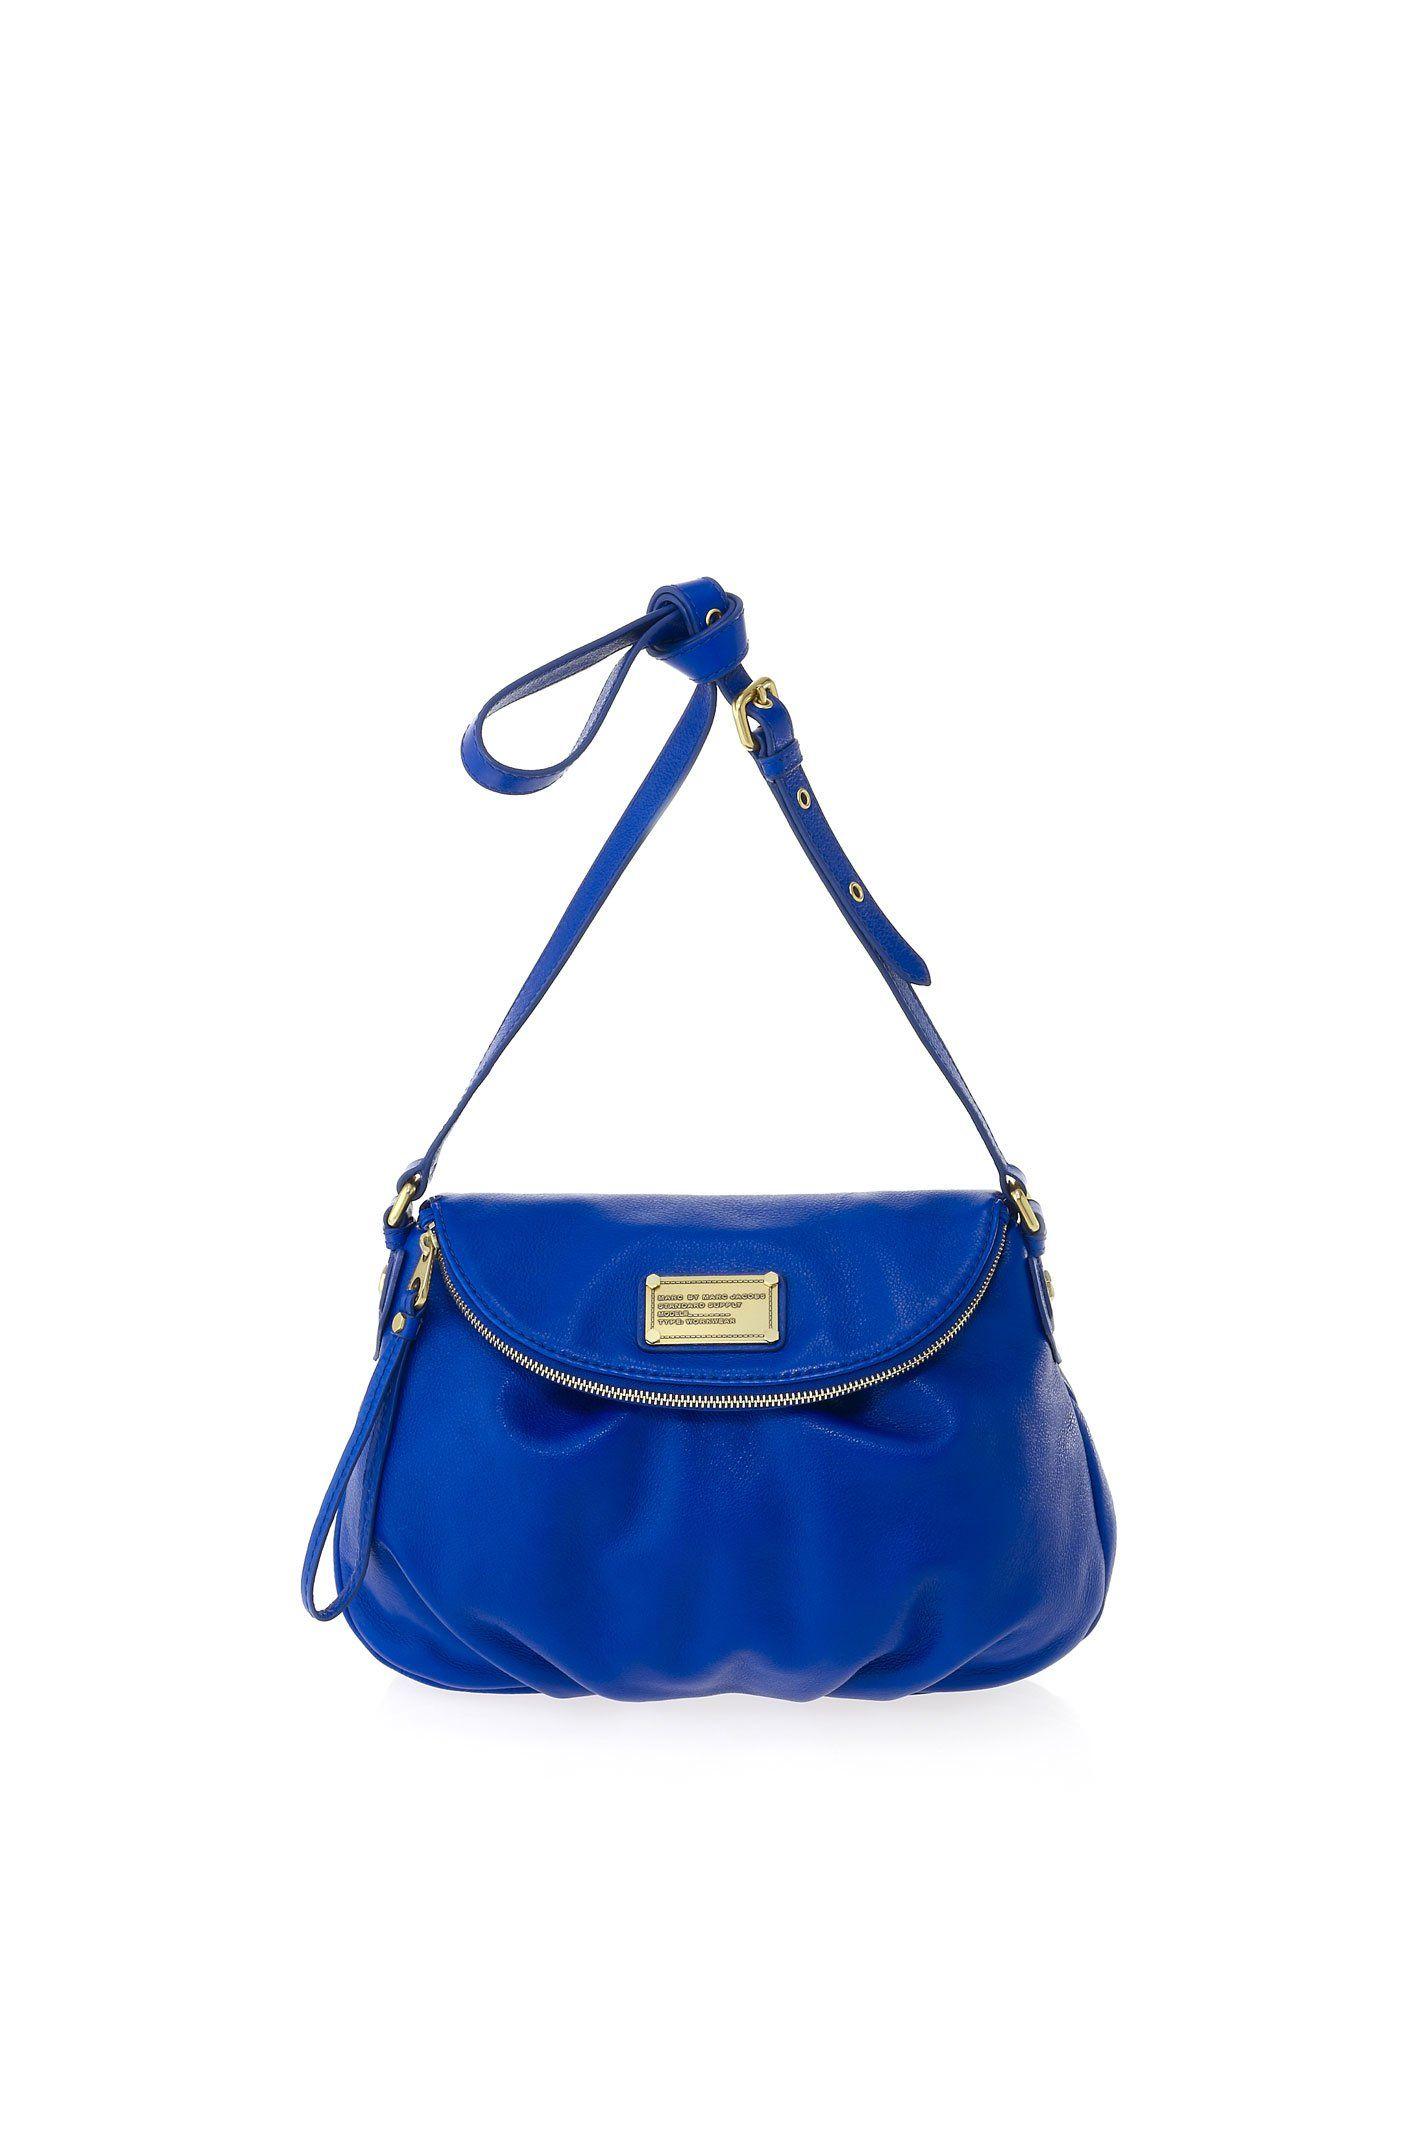 50904fa7749 Classic Q Natasha - M3122049 - Marc By Marc Jacobs - Womens - Bags - Marc  Jacobs